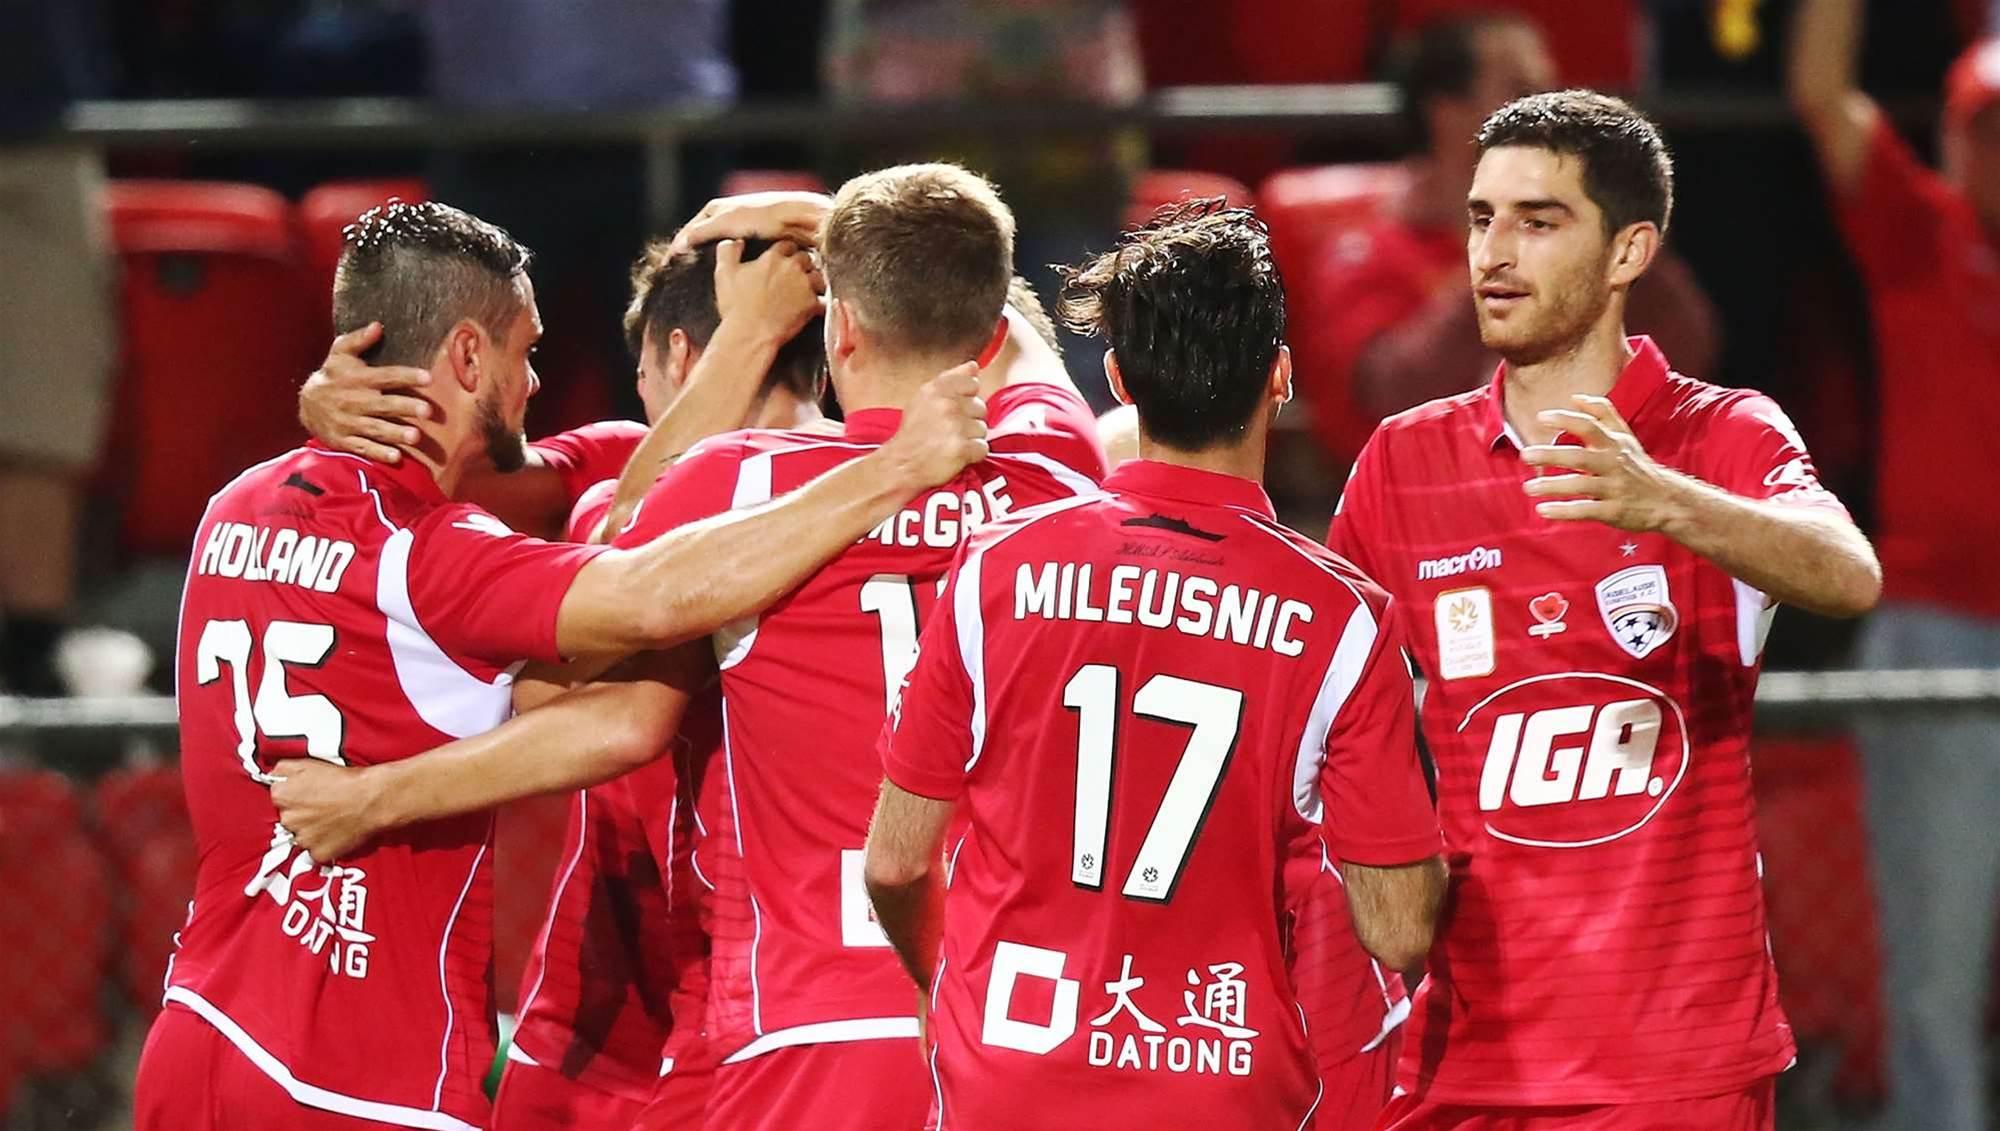 McGowan: Reds took a step forward